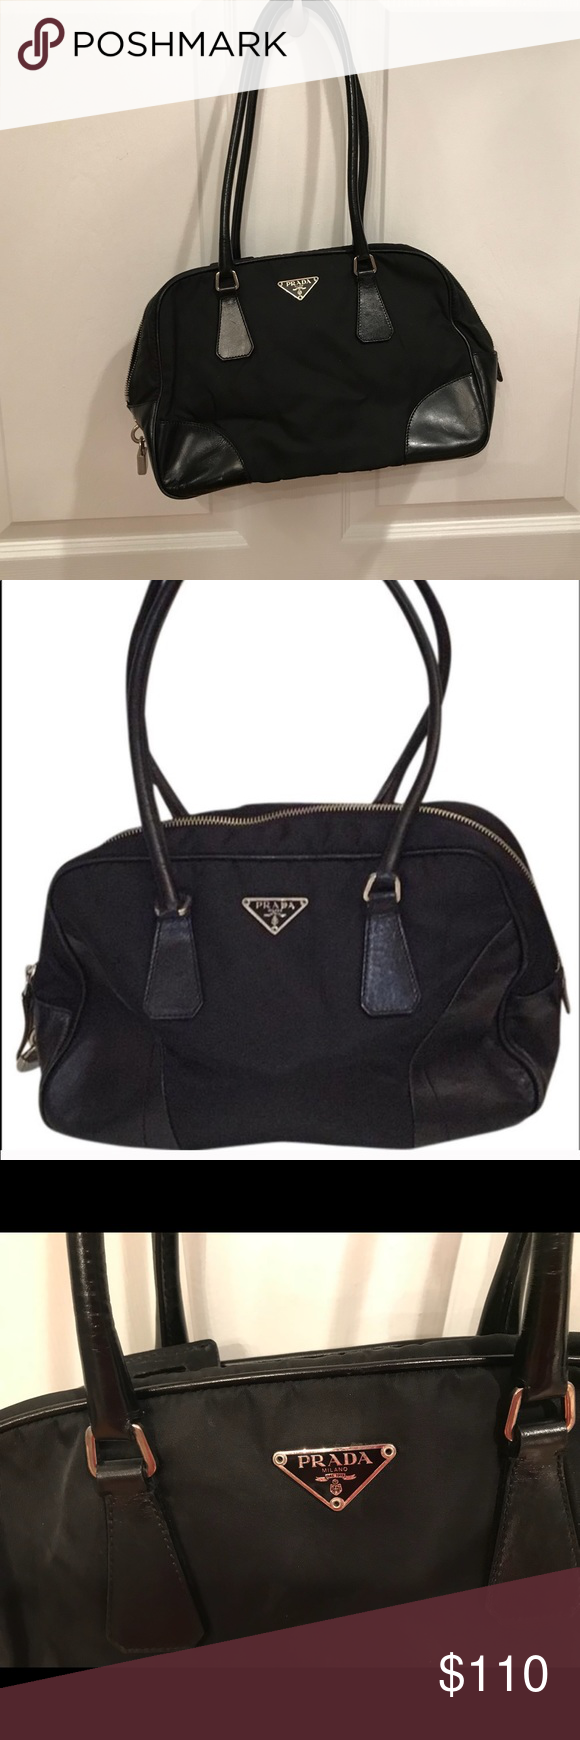 AUTHENTIC Prada Bowling Bag Prada Leather   Nylon Black Bowling Bag.  Lightly worn. No sign of wear or tear. In great condition!!! Prada Bags 0a28b3fefd